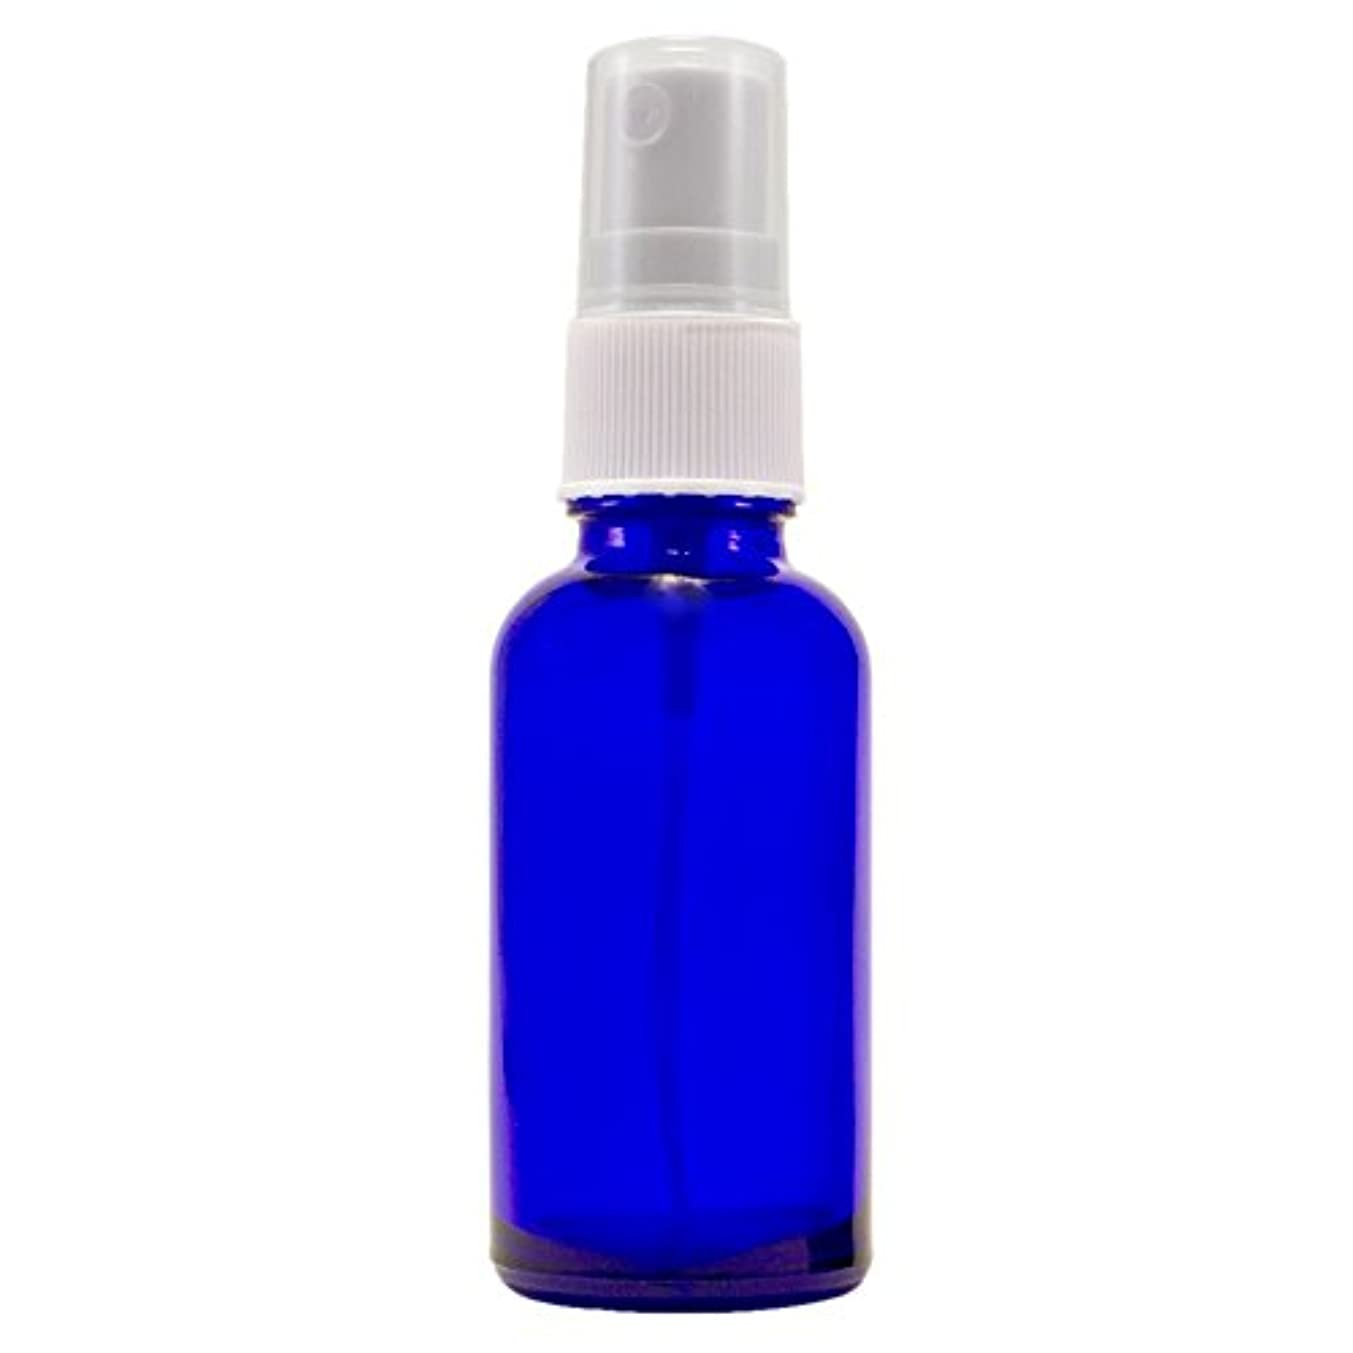 東部最近放牧するWyndmere Naturals - Glass Bottle W/mist Sprayer 4oz, 1 Bottles (1) by Wyndmere Naturals